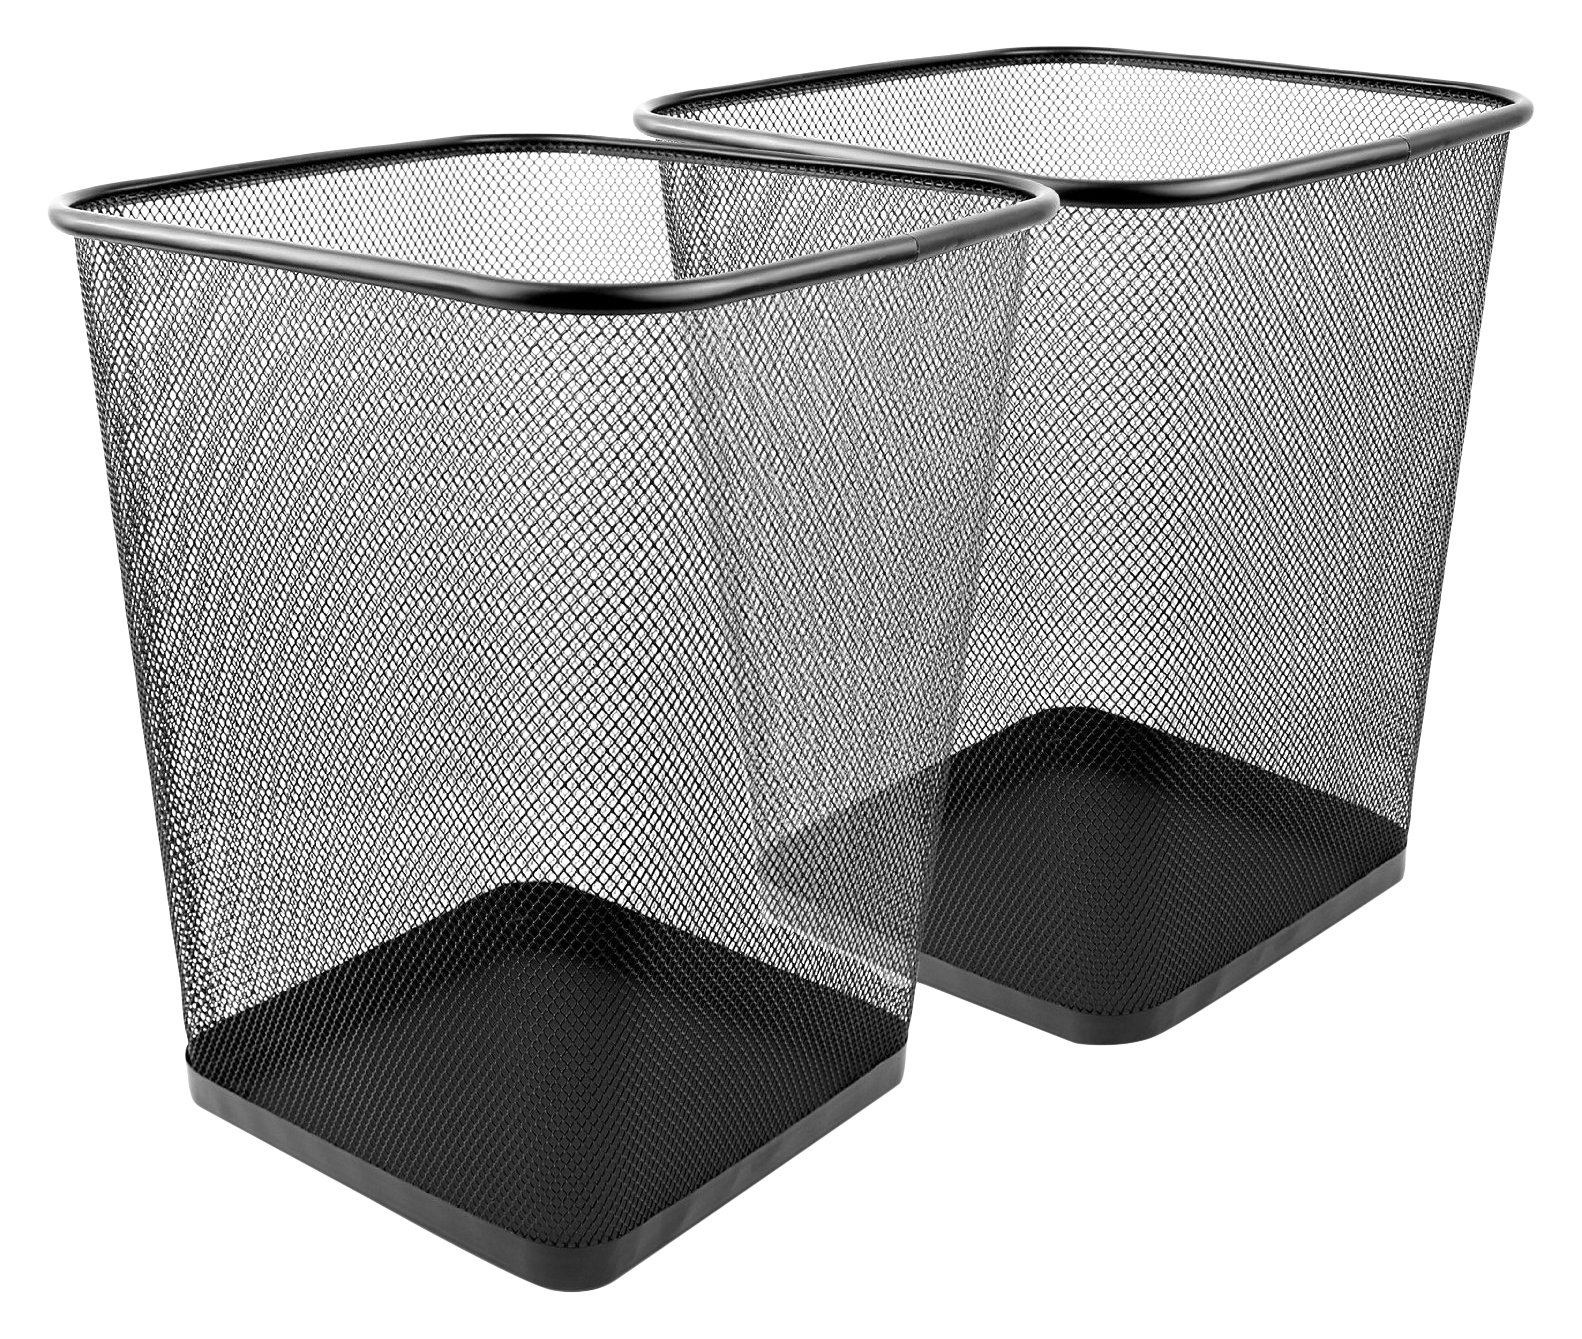 Greenco Mesh Wastebasket Trash Can, Square, 6 Gallon, Black, 2 Pack